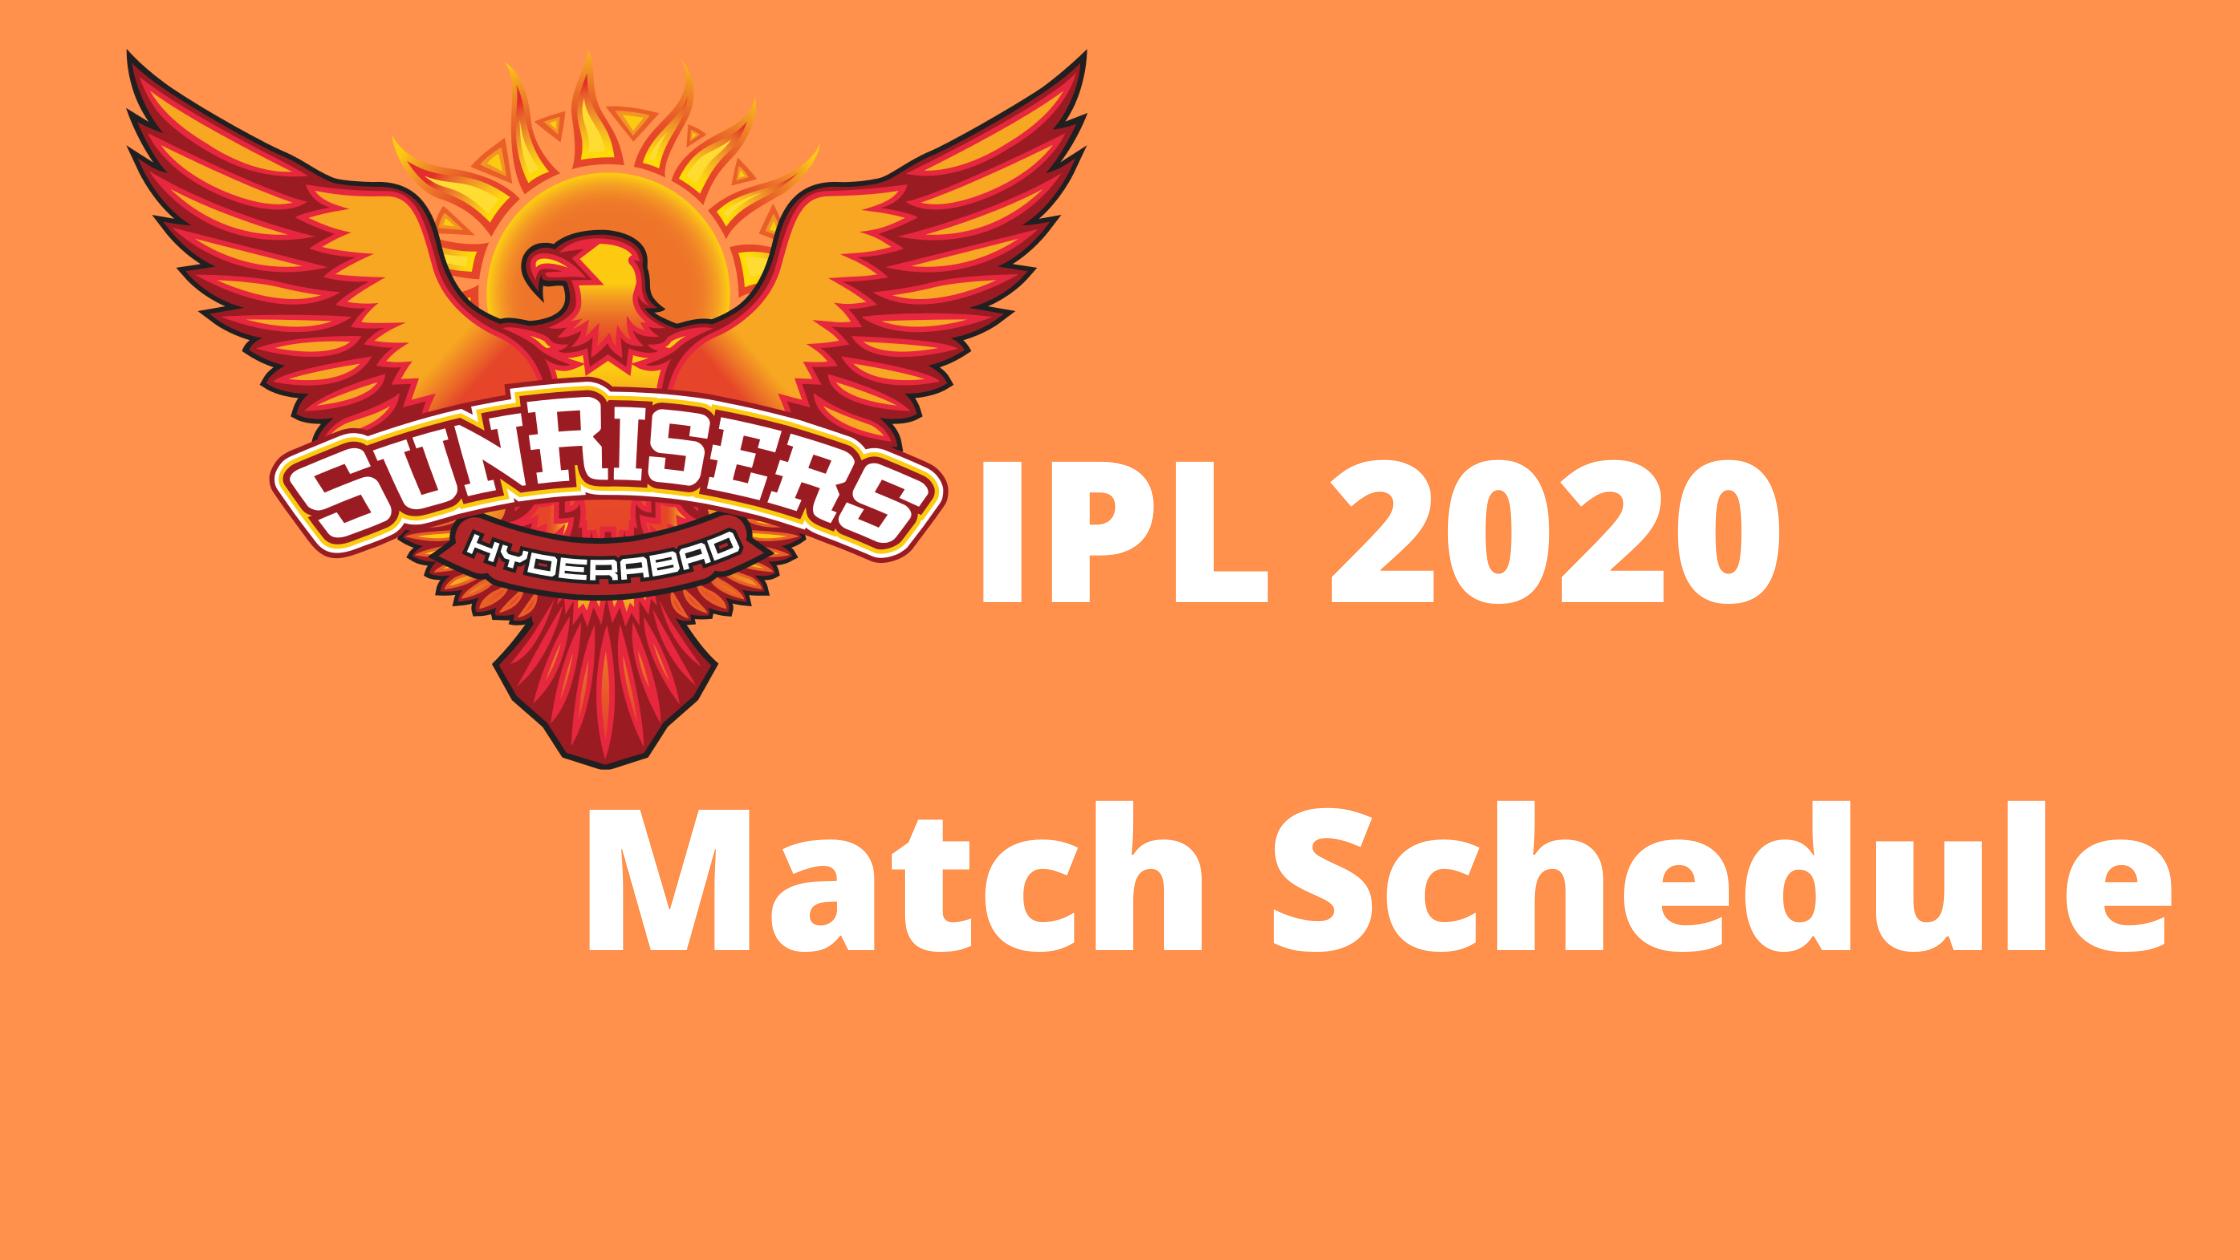 Dream11 IPL 2020 Sunrisers Hyderabad Match Schedule